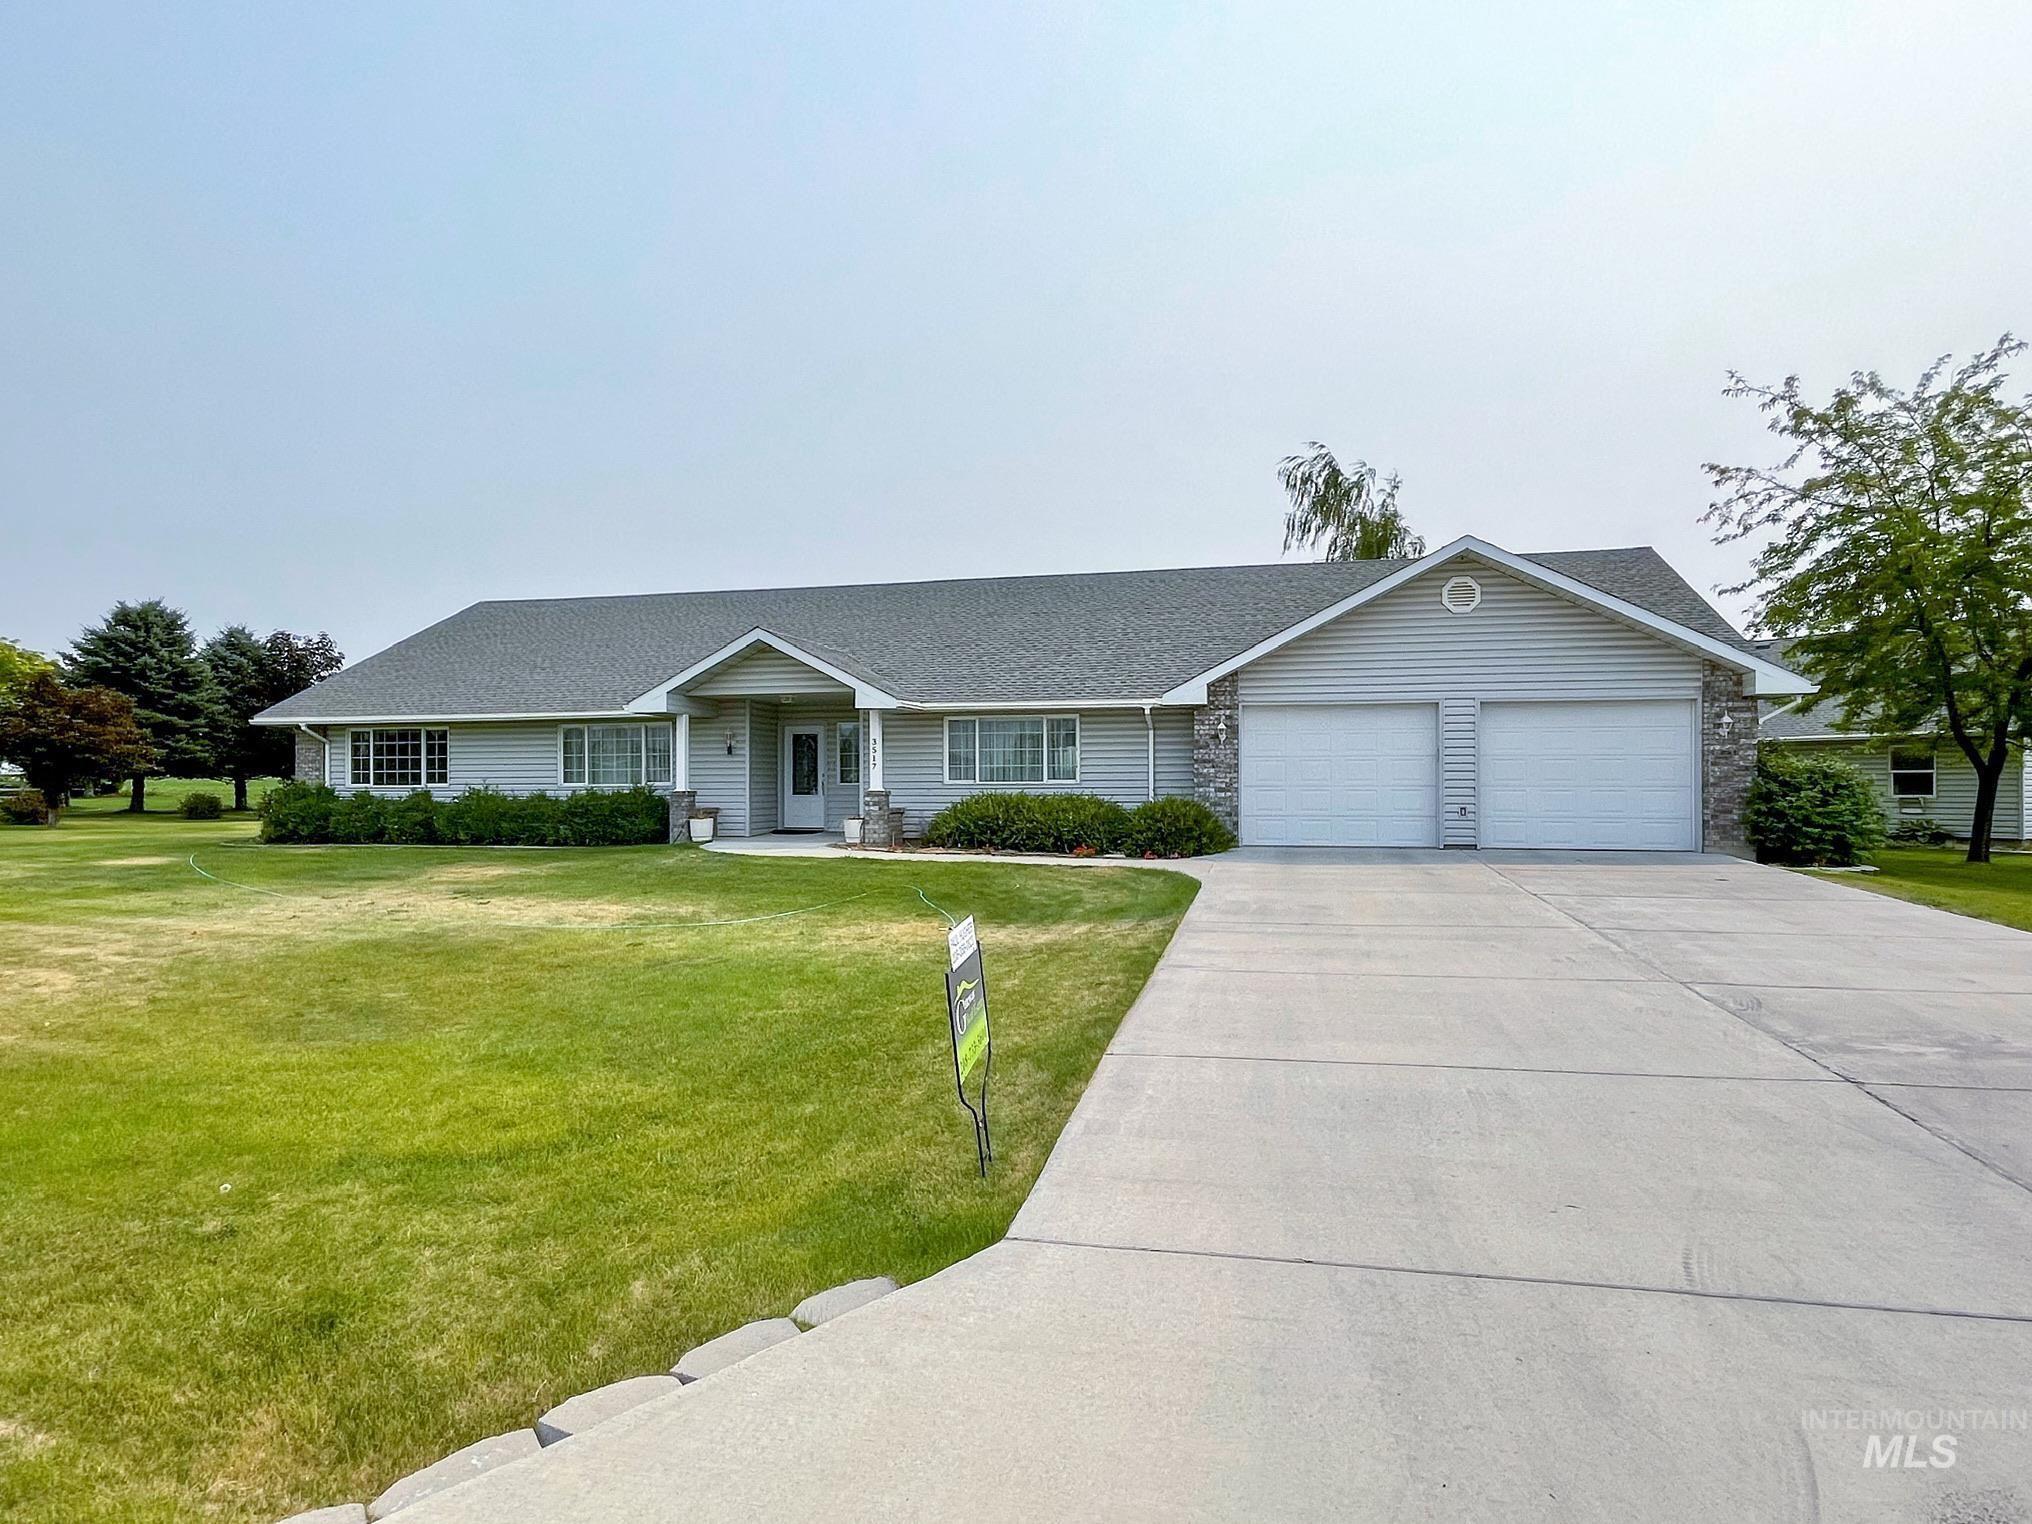 3517 E 3980 N Property Photo